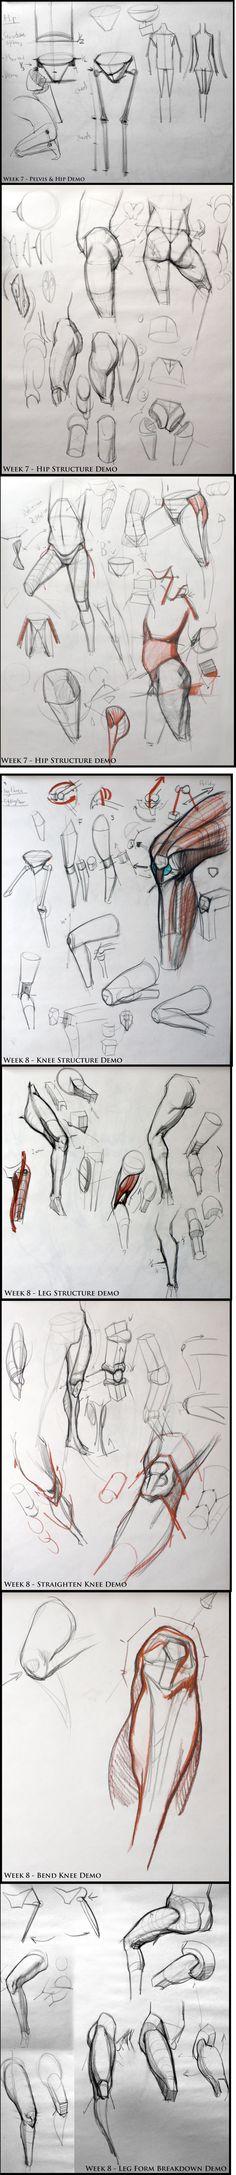 Anatomy Sketches, Anatomy Drawing, Anatomy Art, Human Anatomy, Human Drawing Reference, Drawing Practice, Anatomy Reference, Drawing Legs, Body Drawing